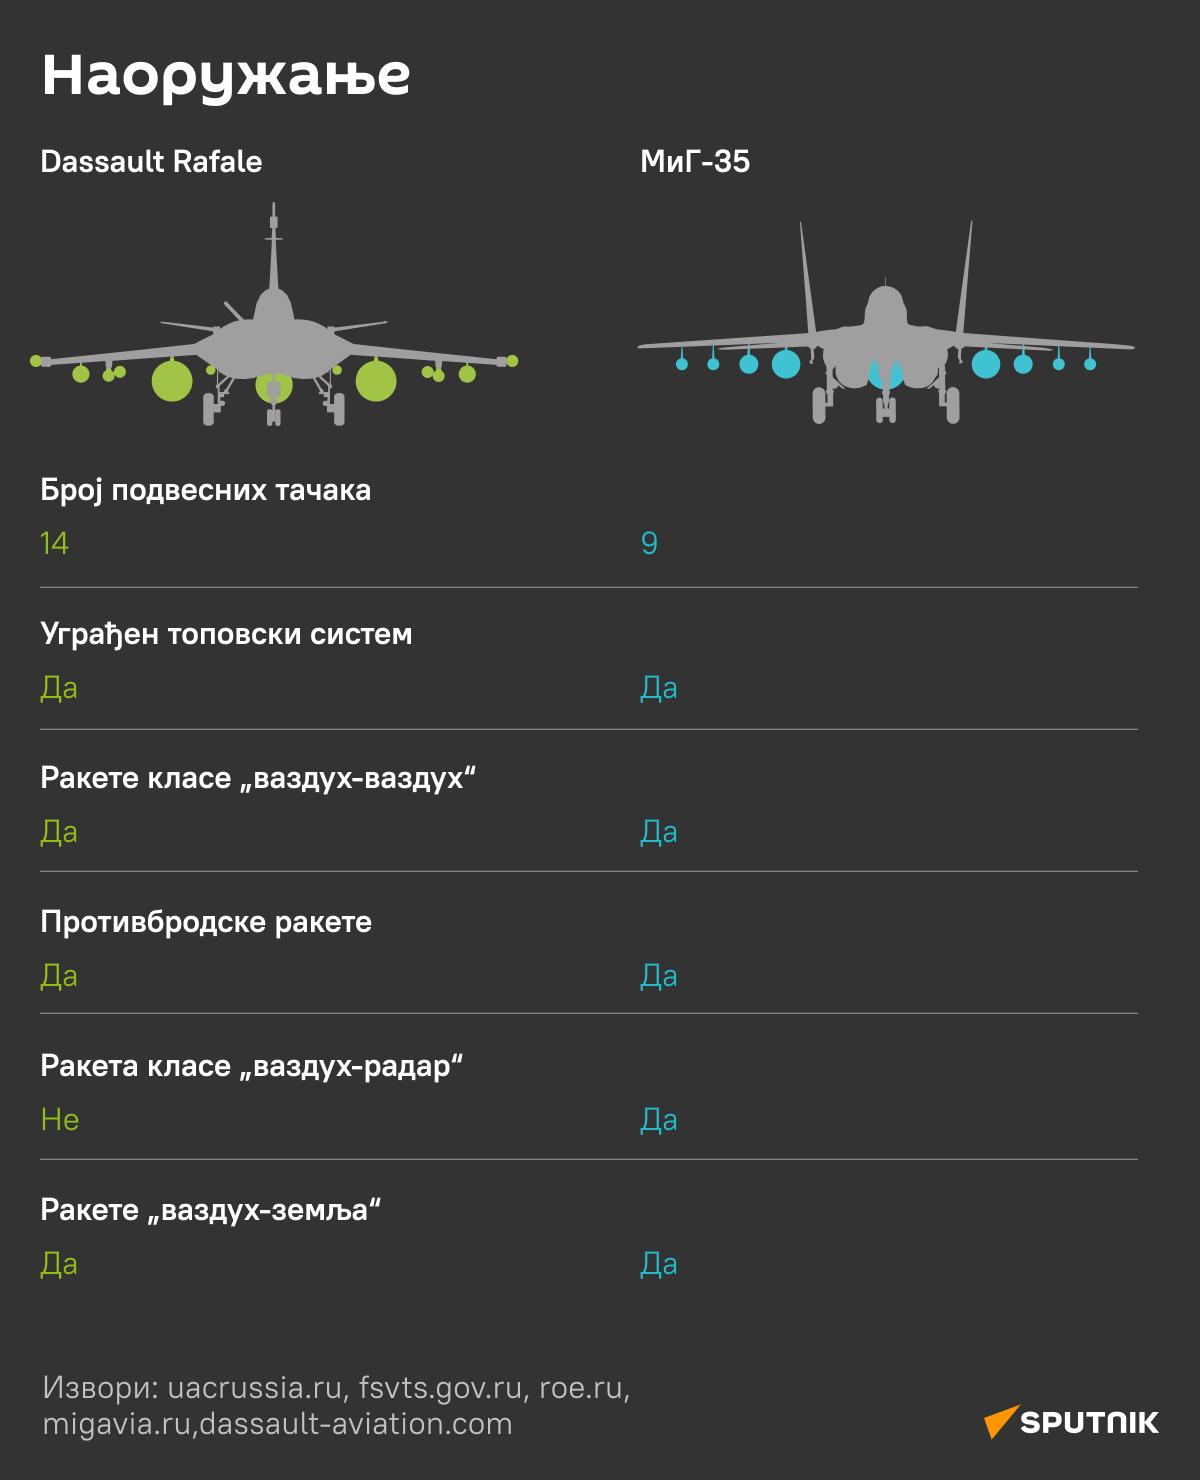 Rafal vs MiG 6 - Sputnik Srbija